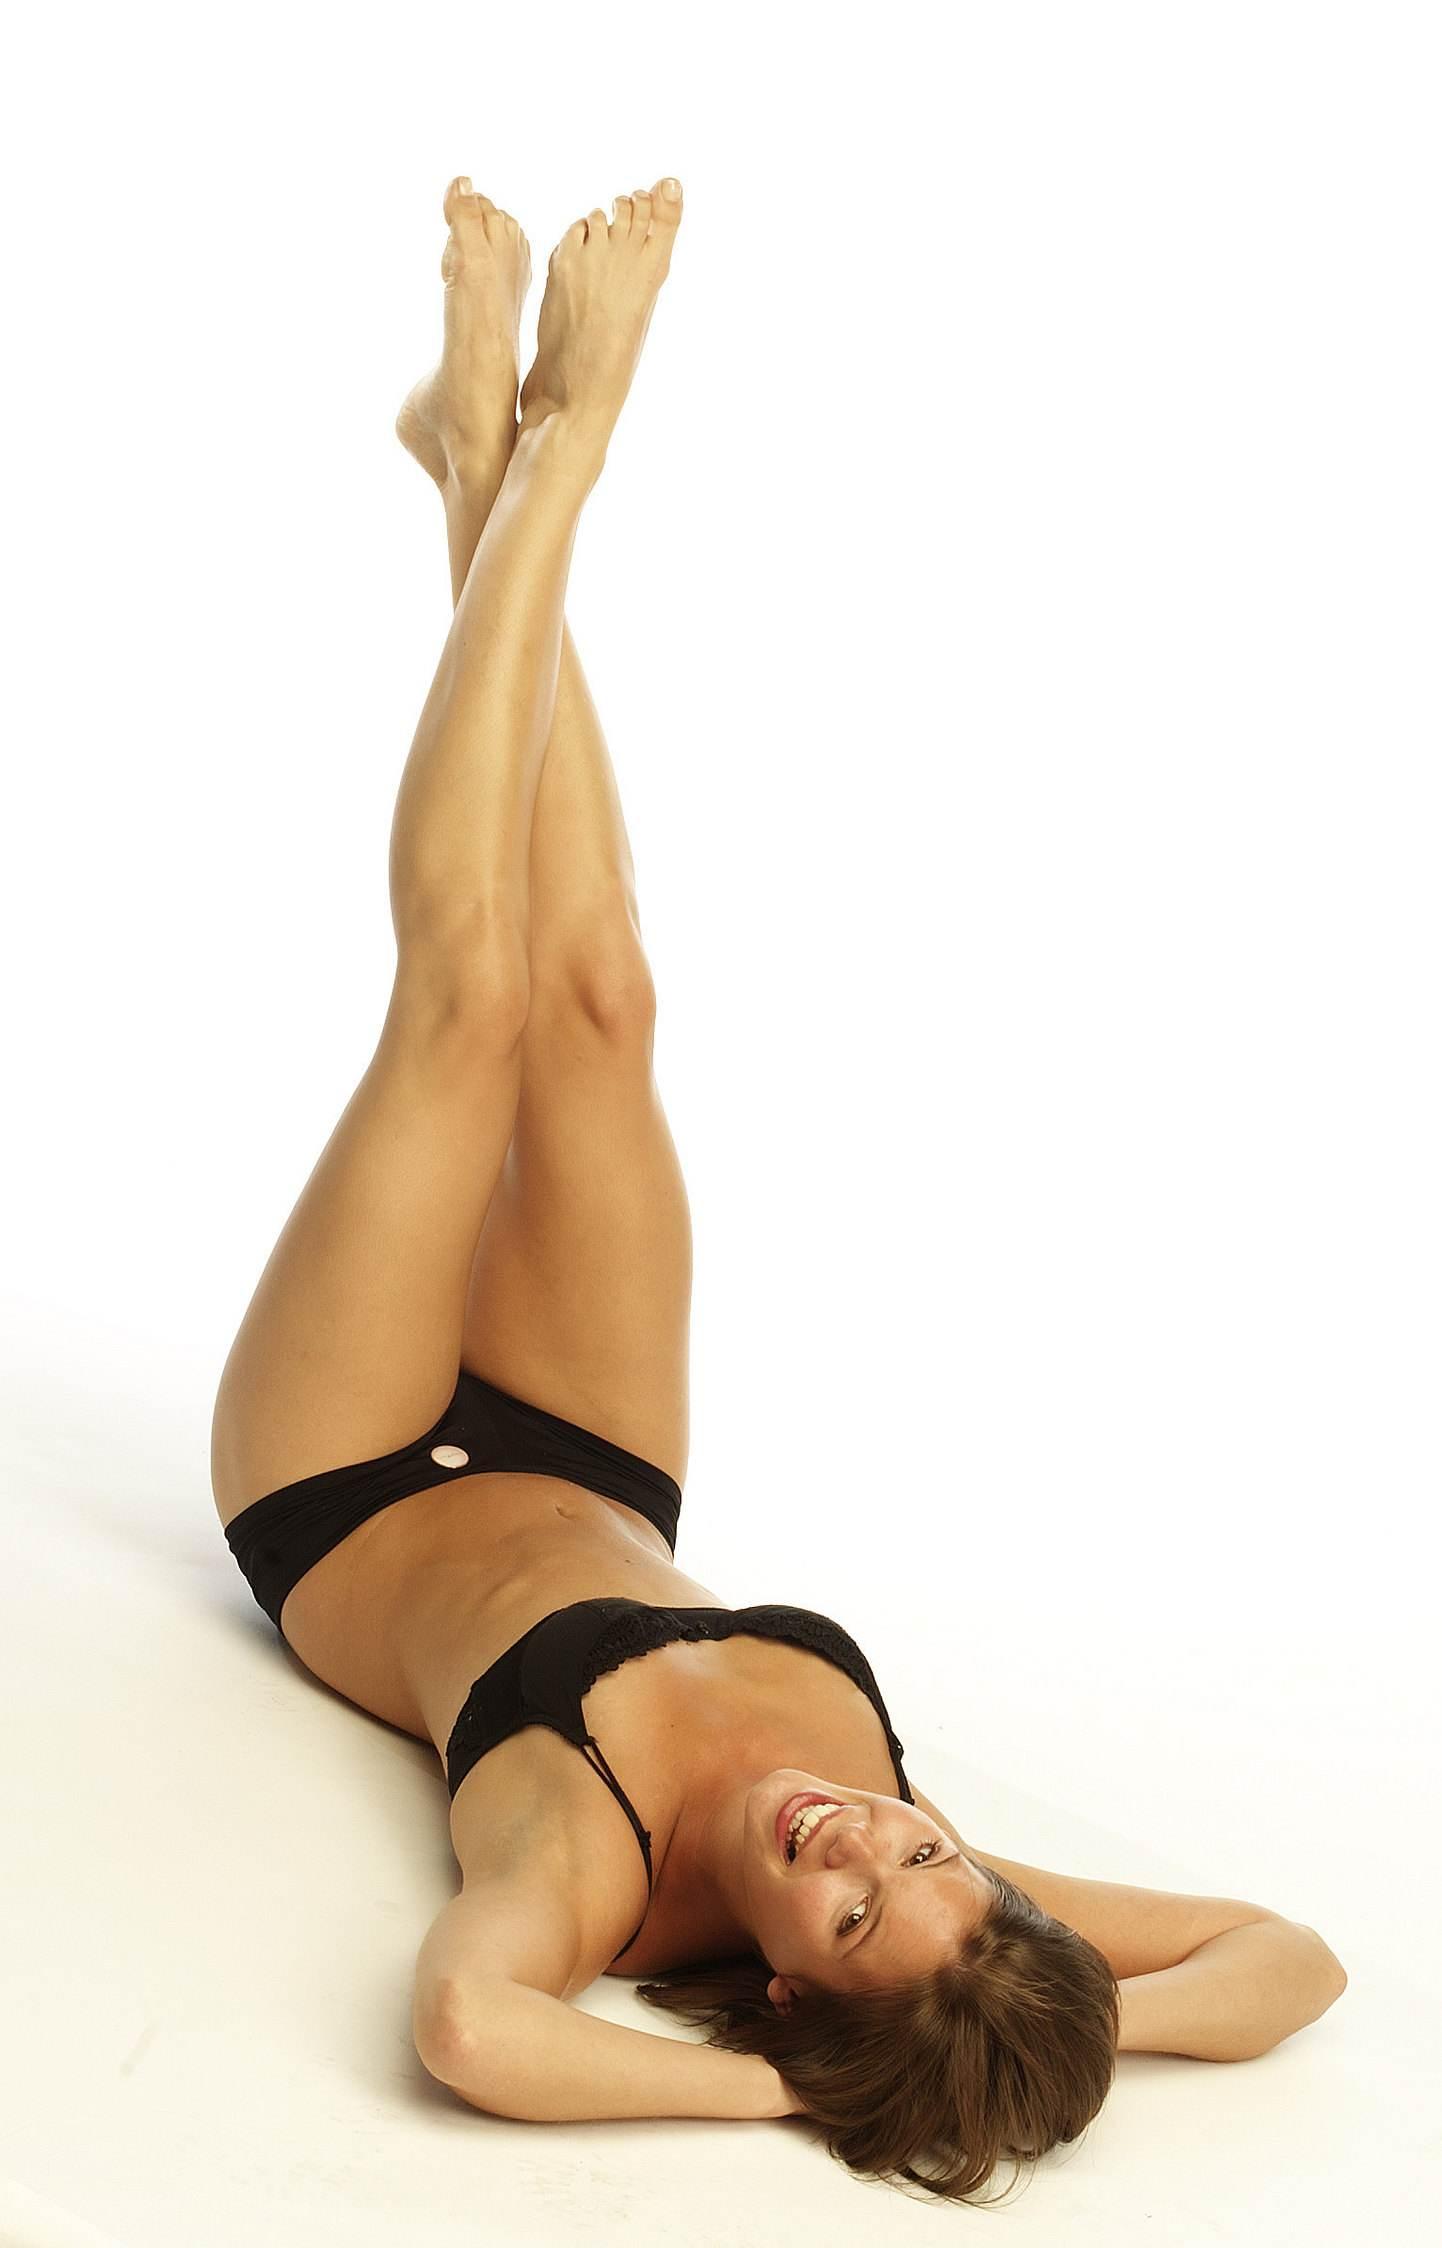 exercitii fizice (www.terapii-alternative.com)